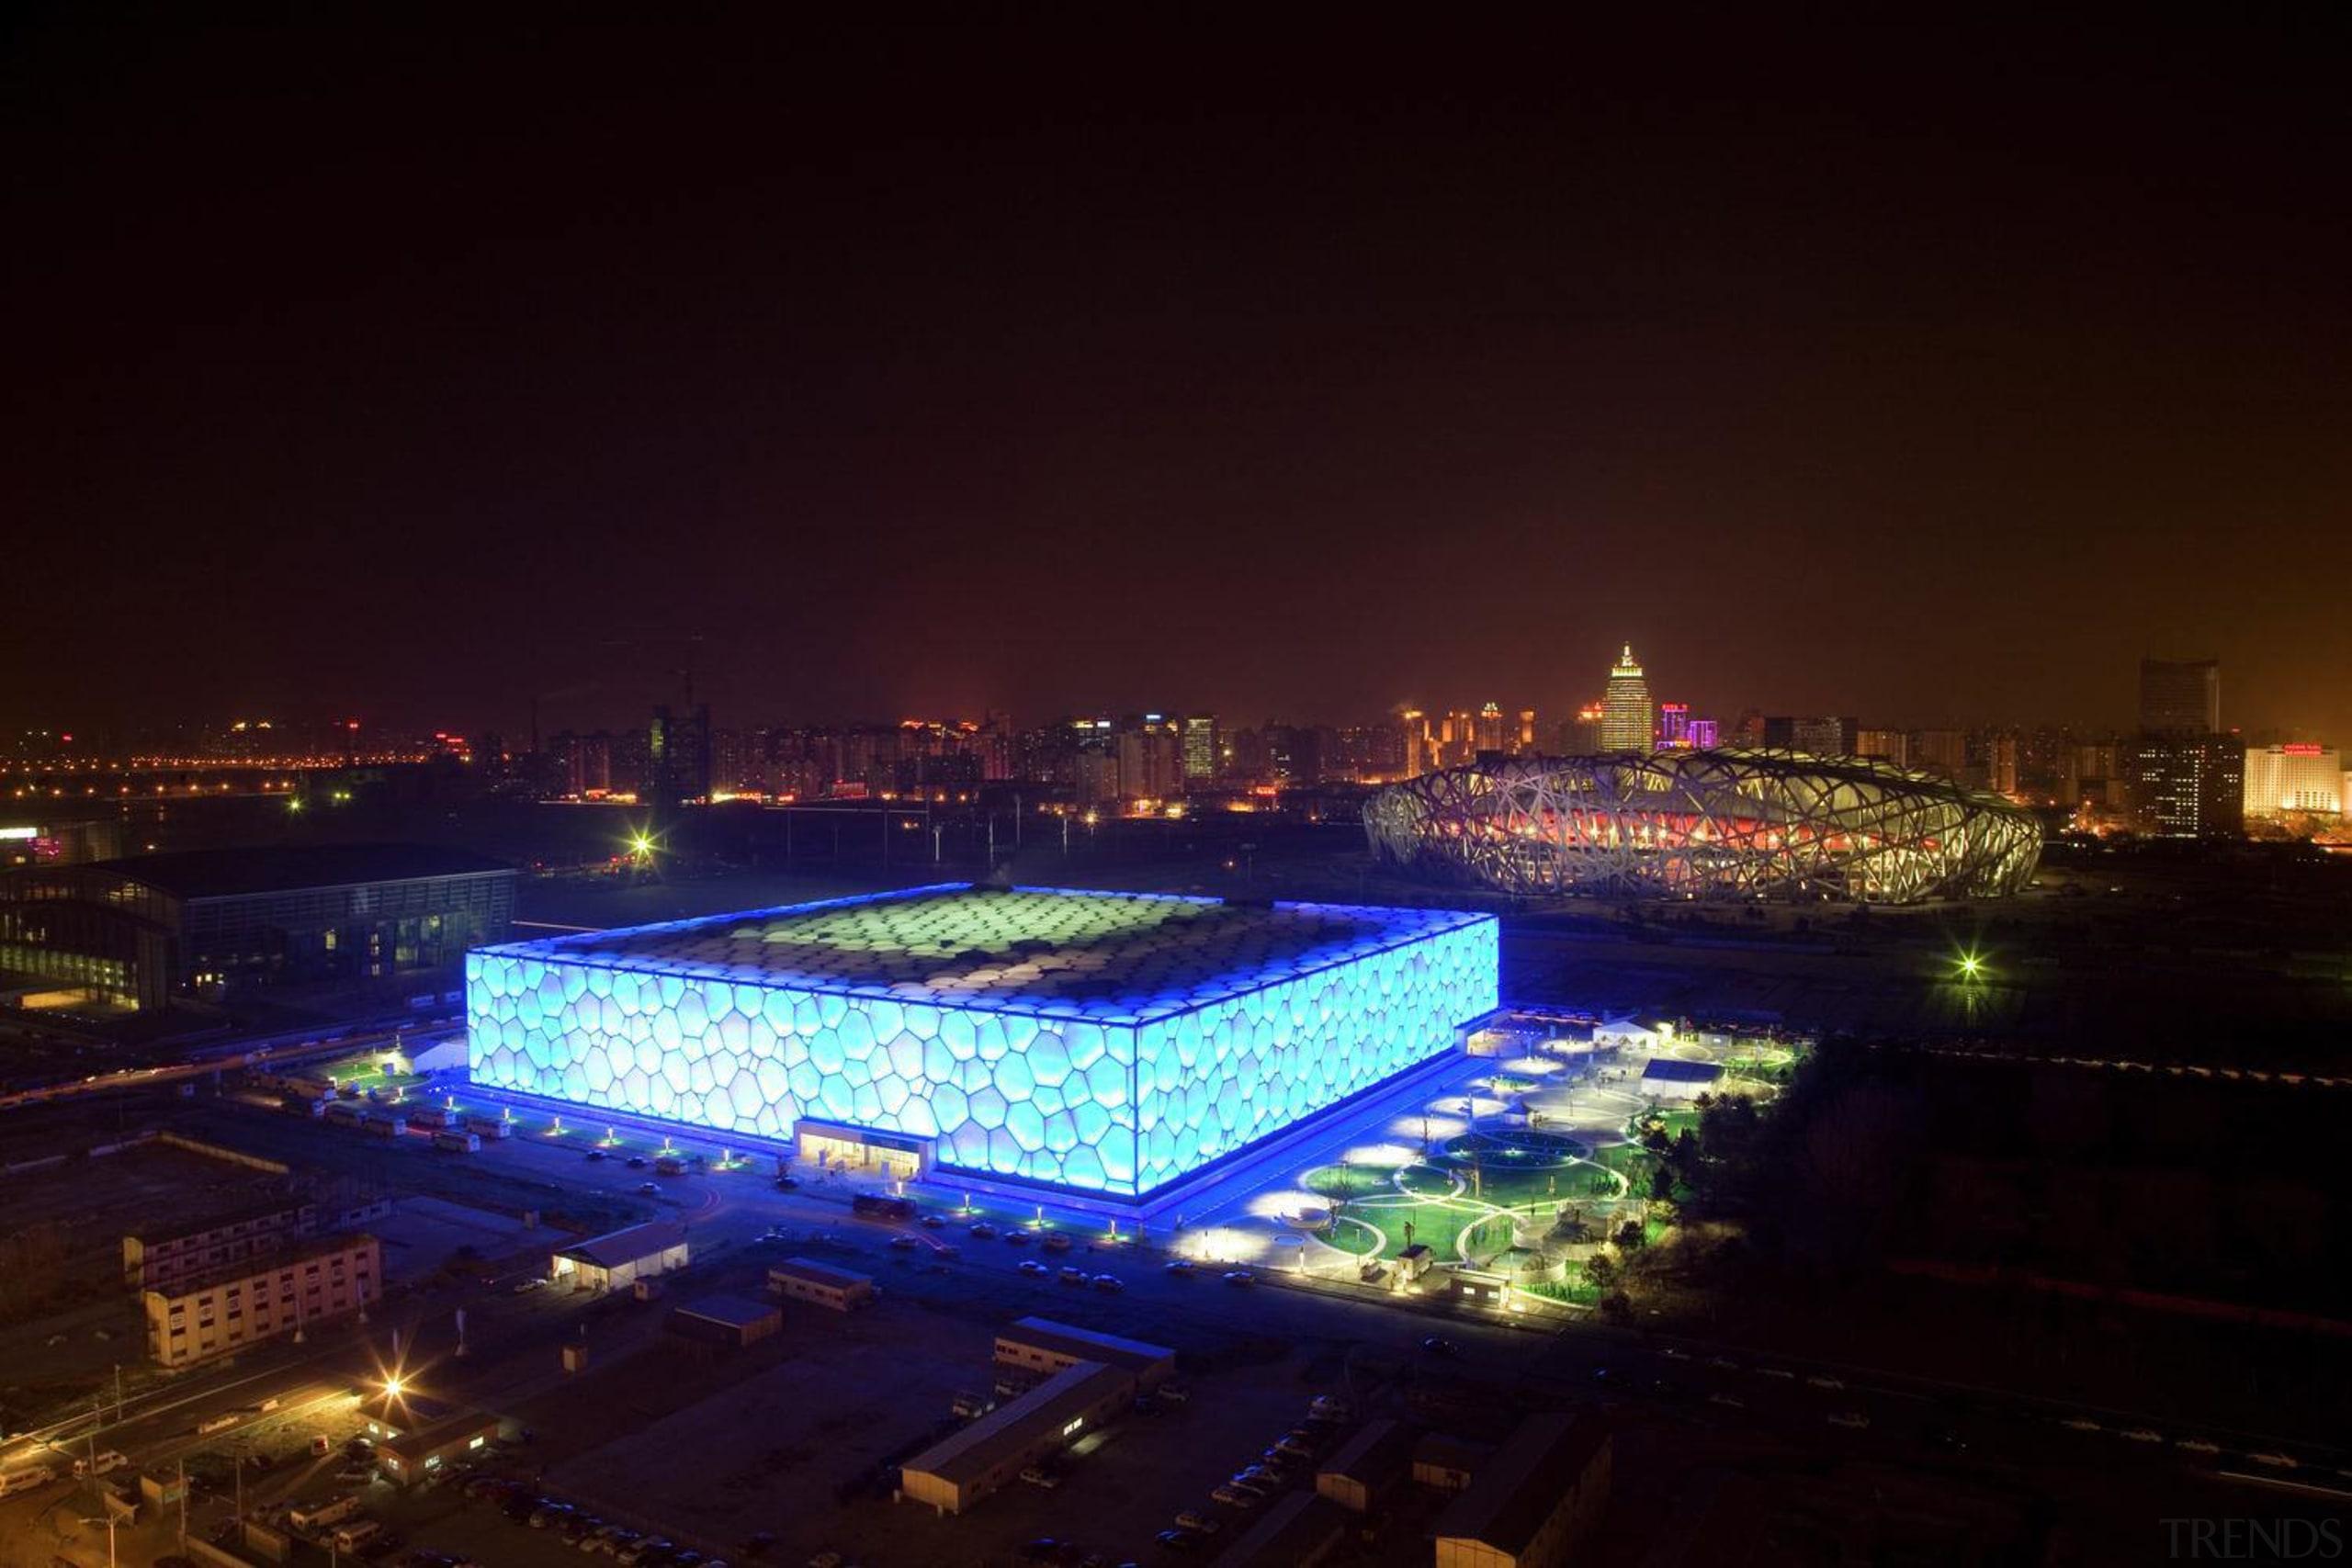 The 70,000 m² National Aquatics Center in Beijing architecture, city, cityscape, downtown, landmark, metropolis, metropolitan area, night, sky, skyline, sport venue, structure, tourist attraction, urban area, black